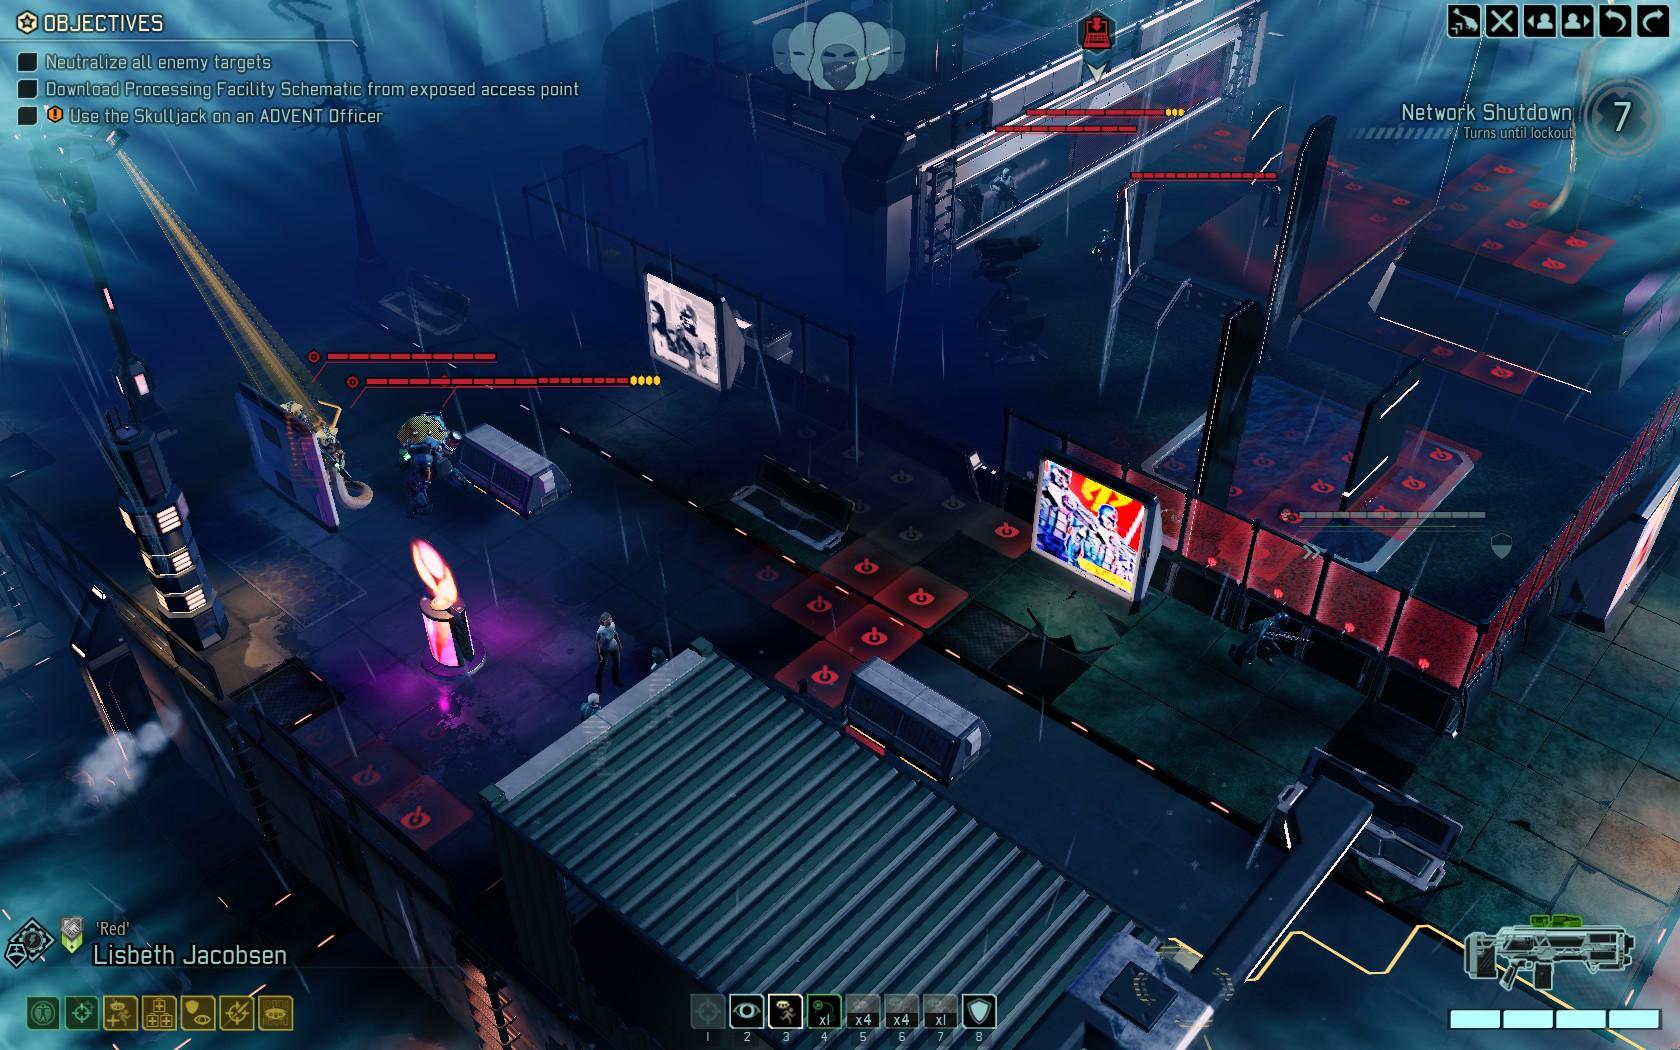 Steam Community :: Guide :: Vel's War of the Chosen Walkthrough